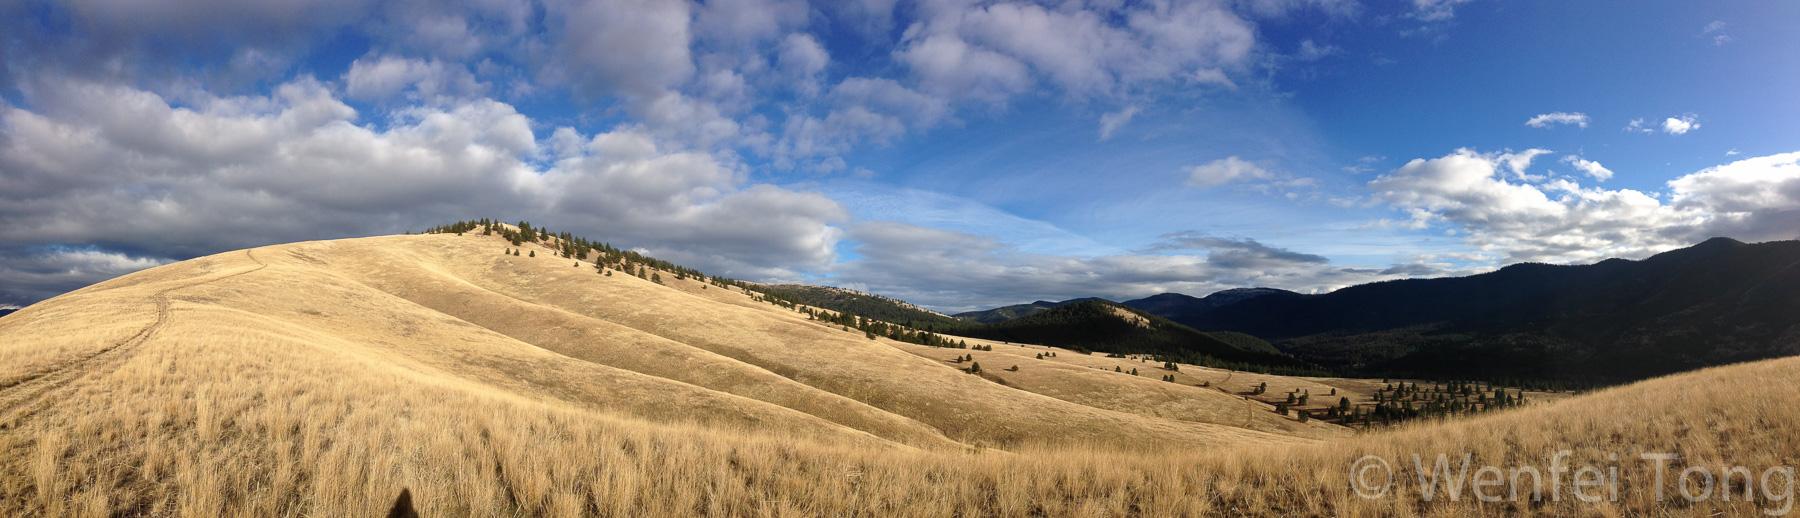 Mount Sentinel in autumn